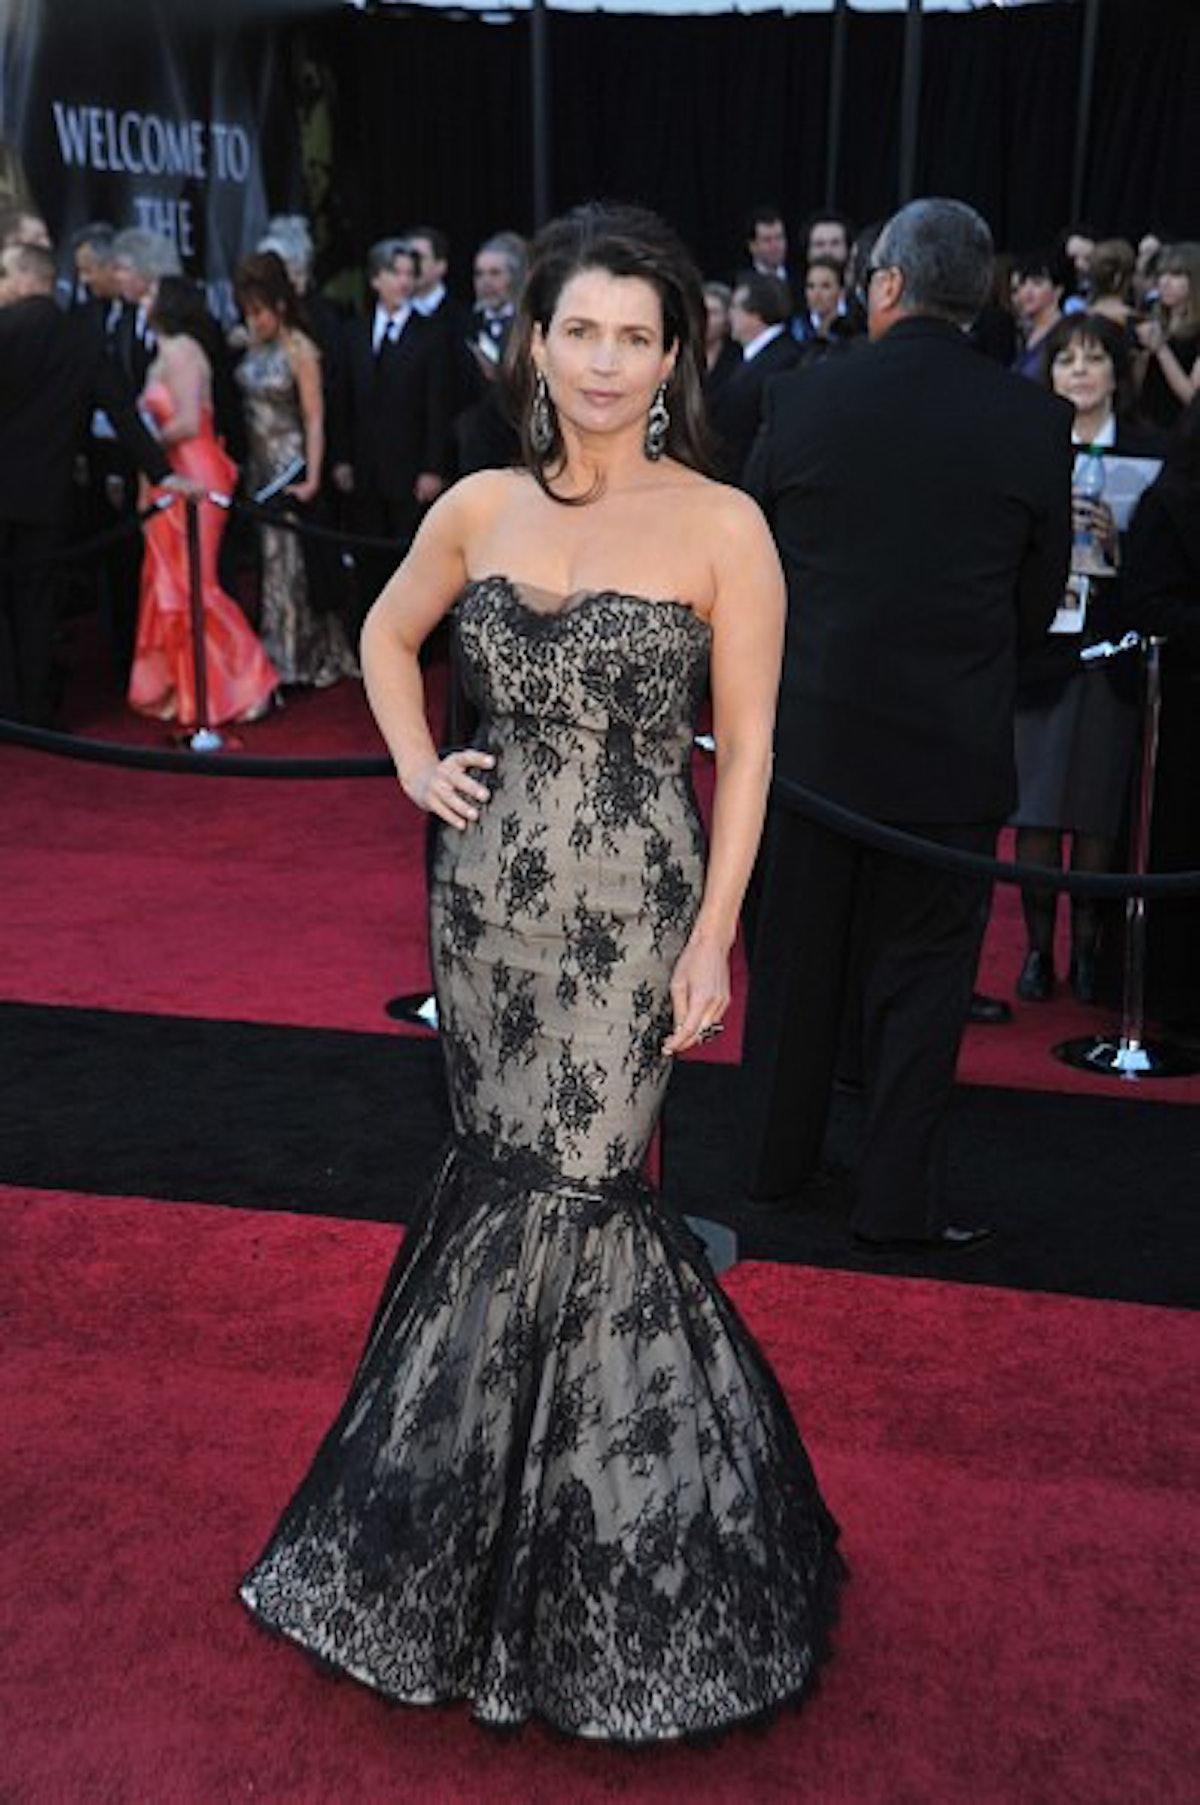 USA - 83rd Academy Awards - Arrivals